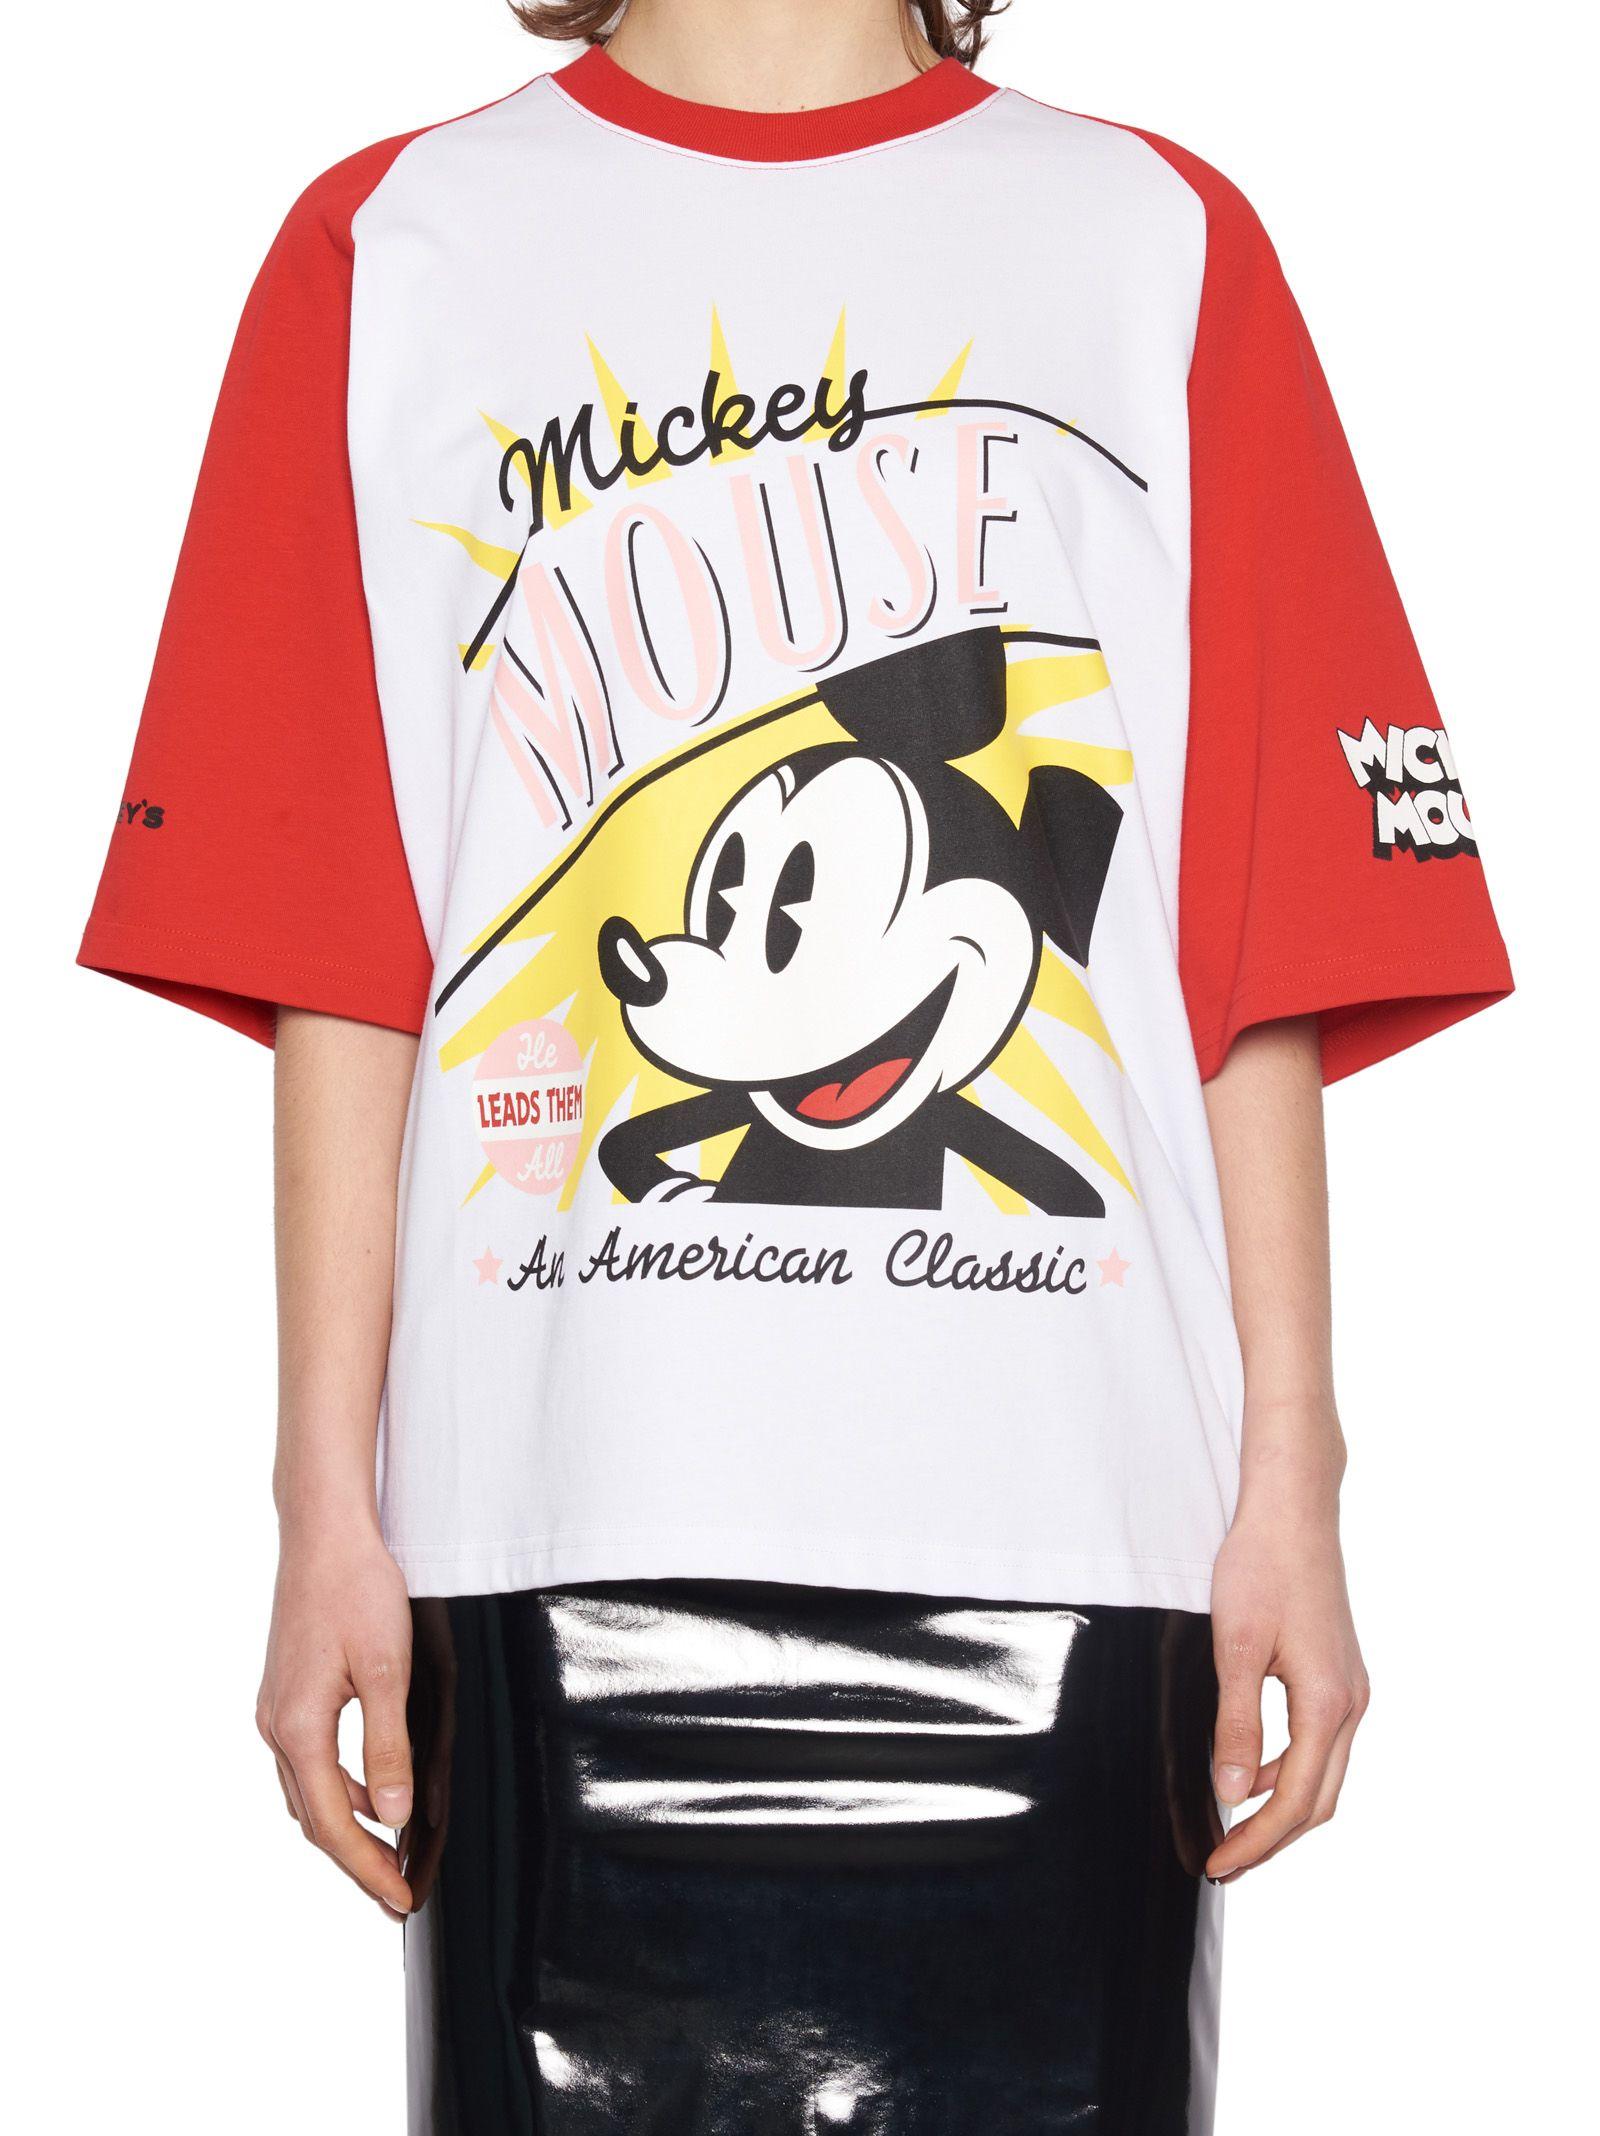 Gcds Gcds X Disney Vintage Mickey Mouse T-Shirt - White, Multicolor